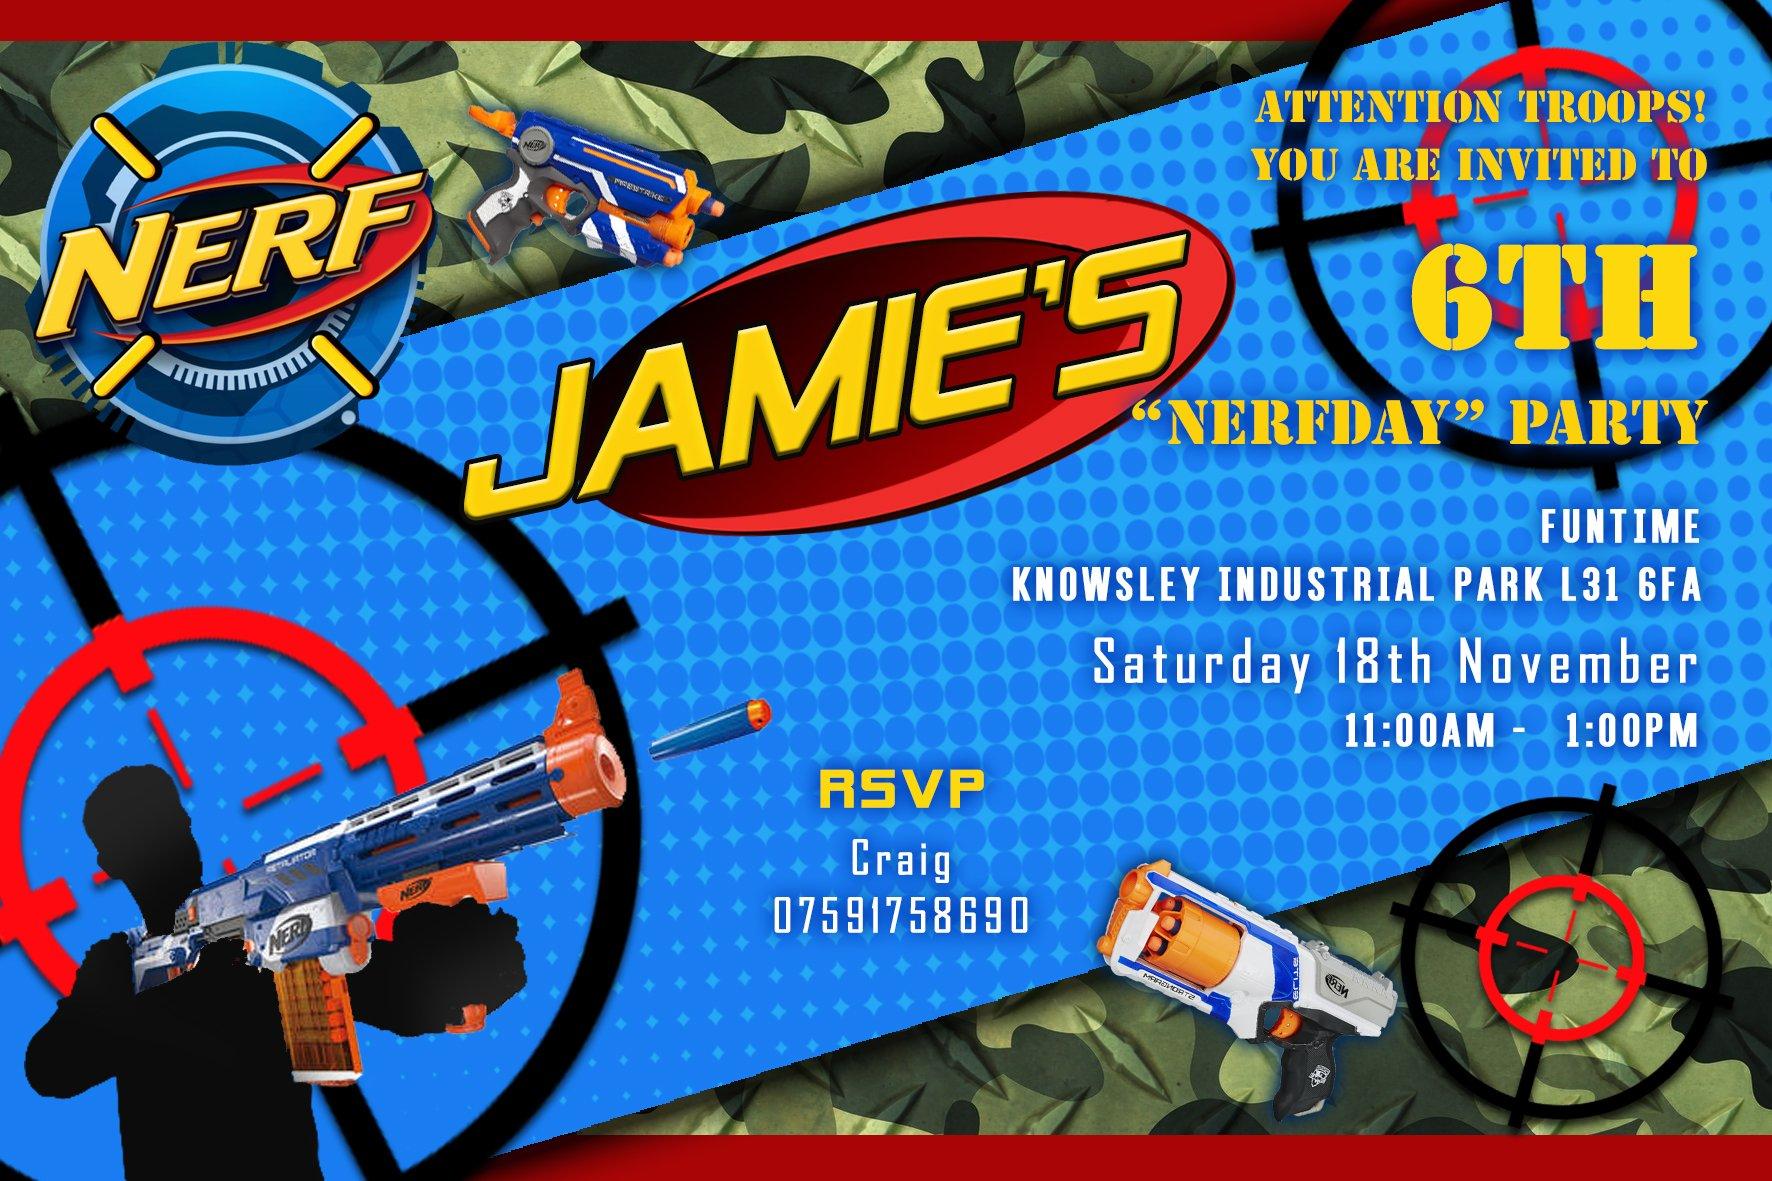 nerf gun party invitations invites